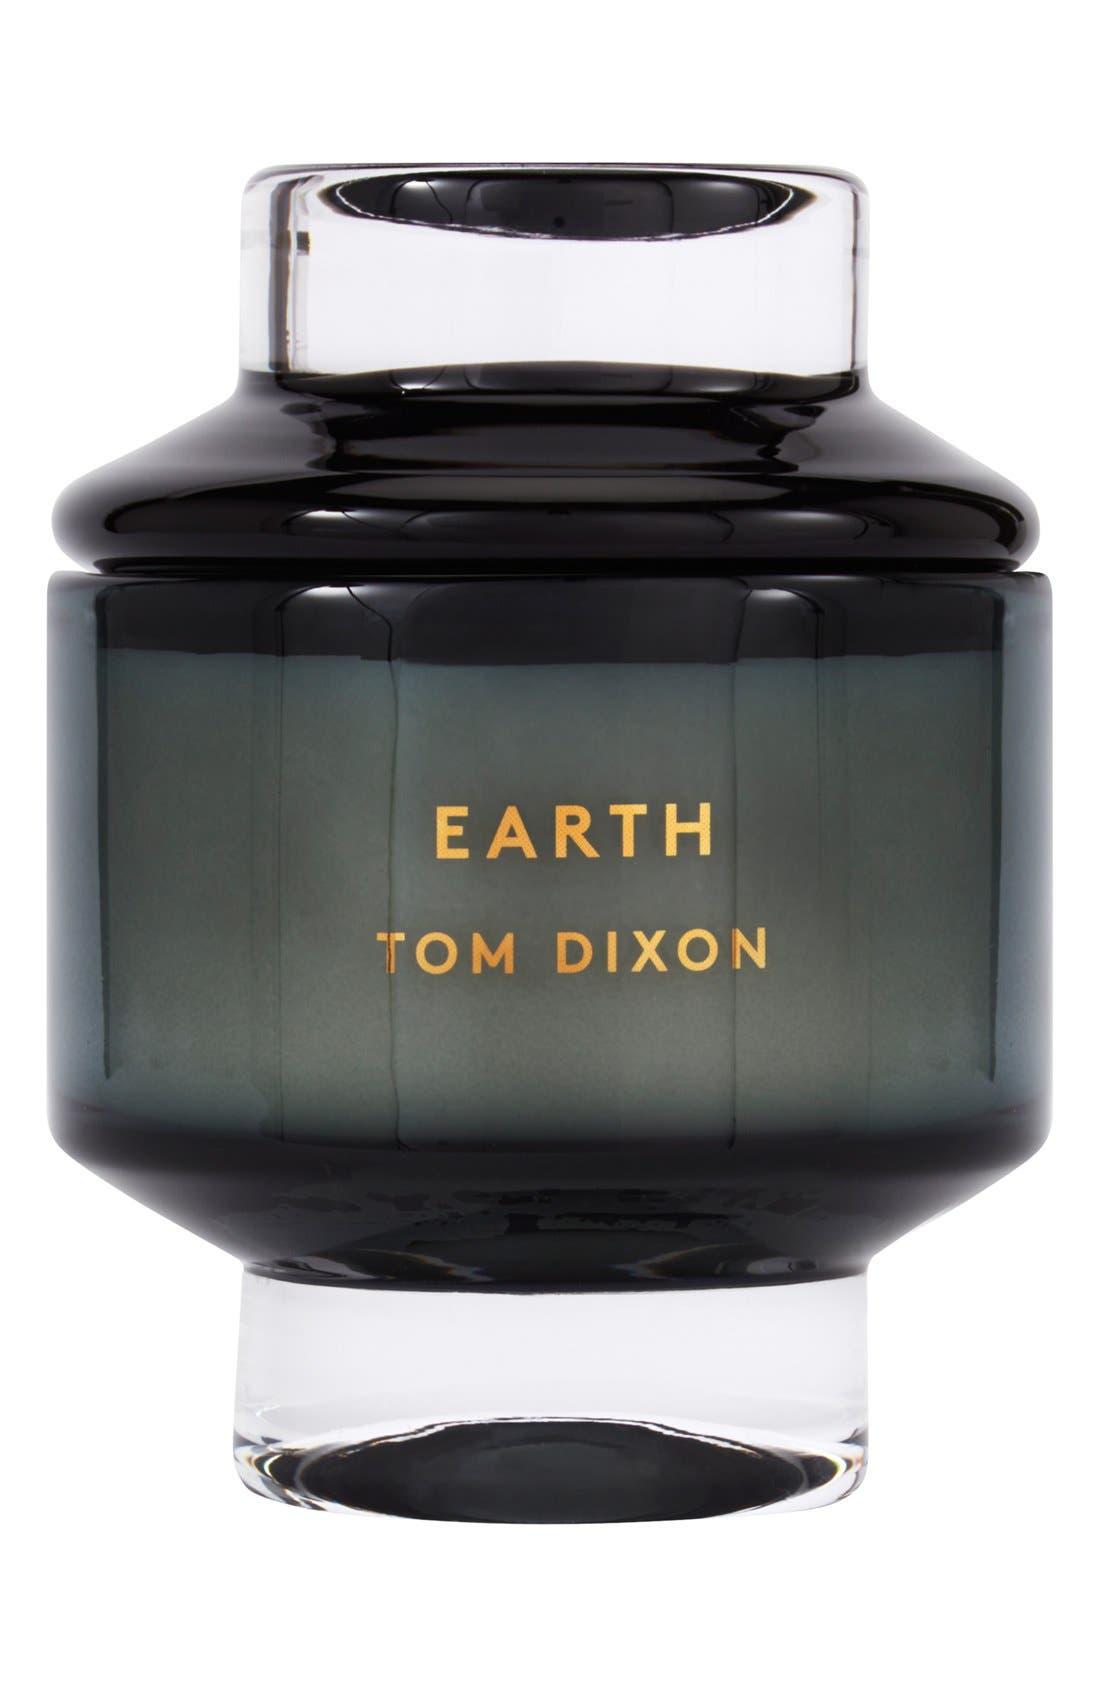 TOM DIXON 'Earth' Candle